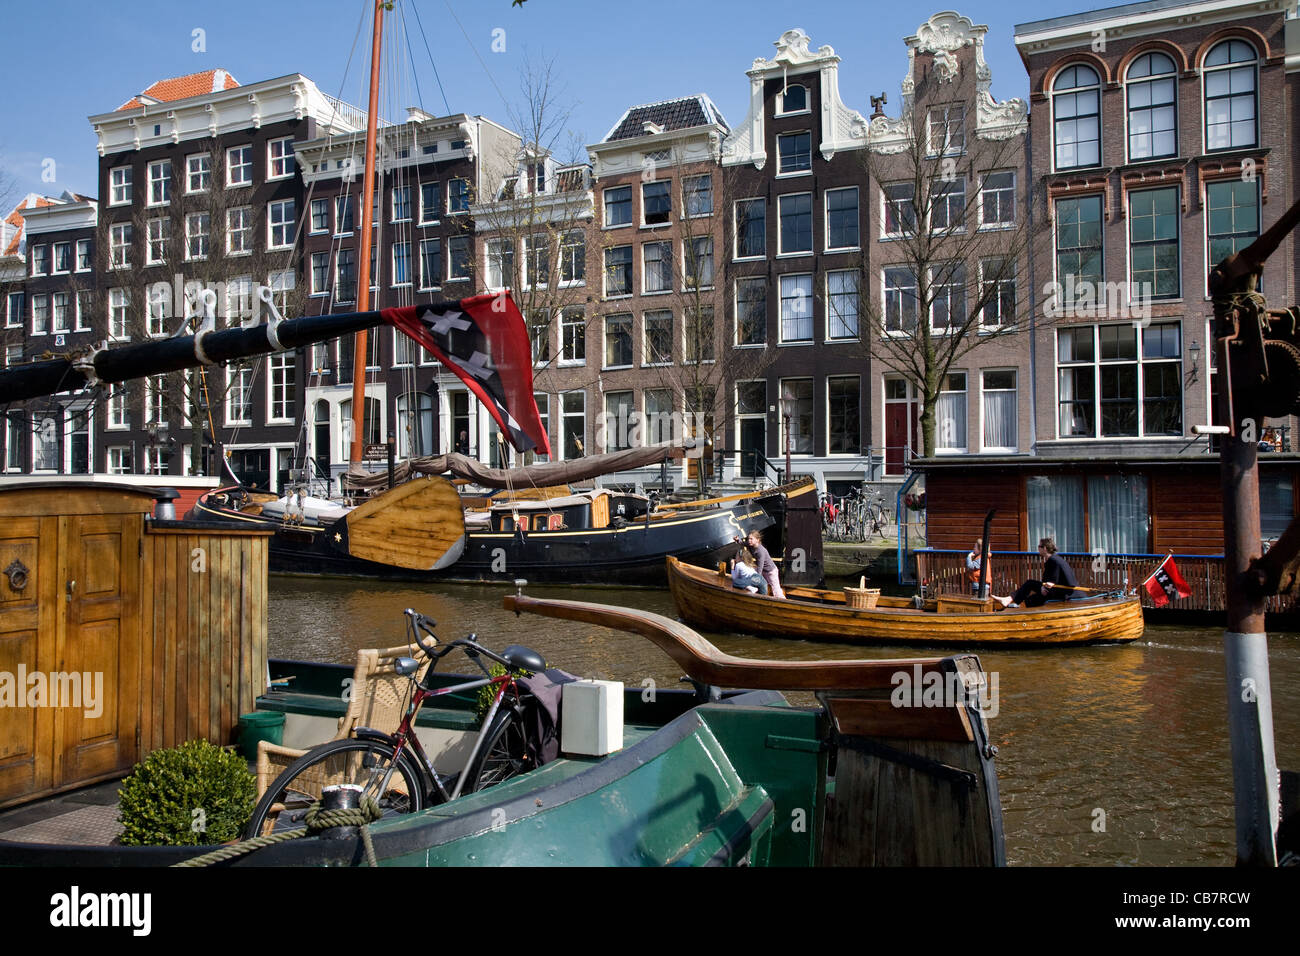 Prinsengracht, Amsterdam, The Netherlands - Stock Image